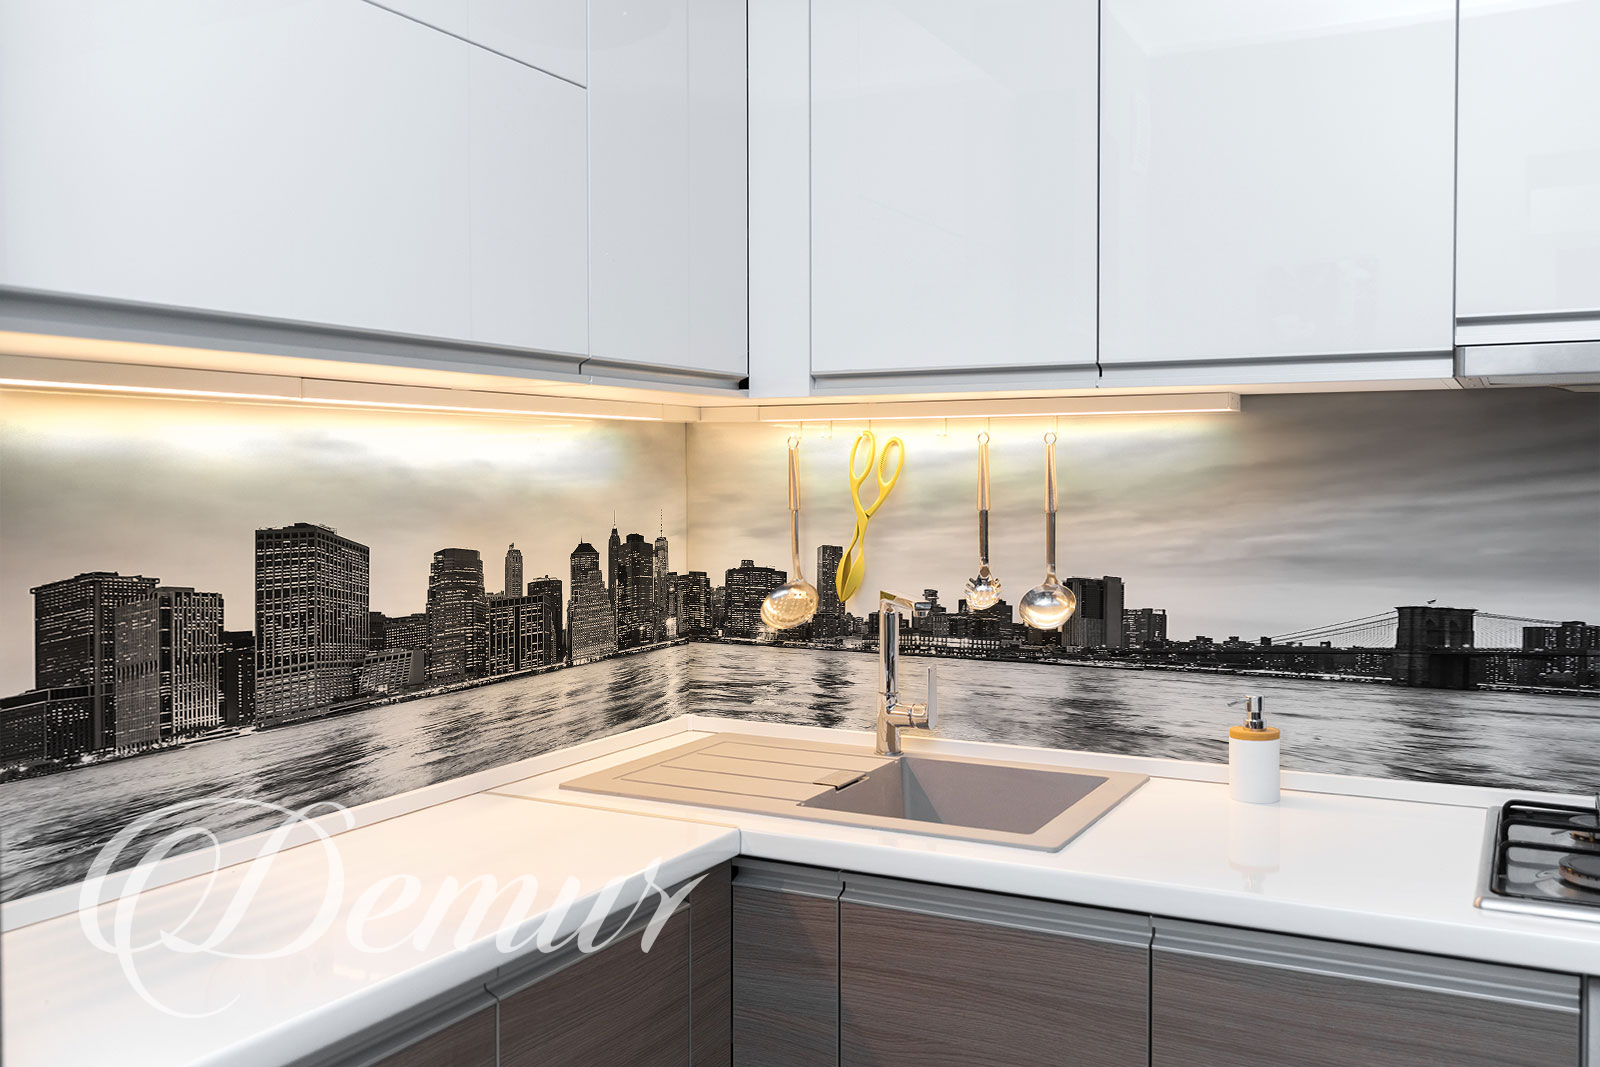 Fototapeta miejska panorama - Fototapety do kuchni zmywalne - Demur